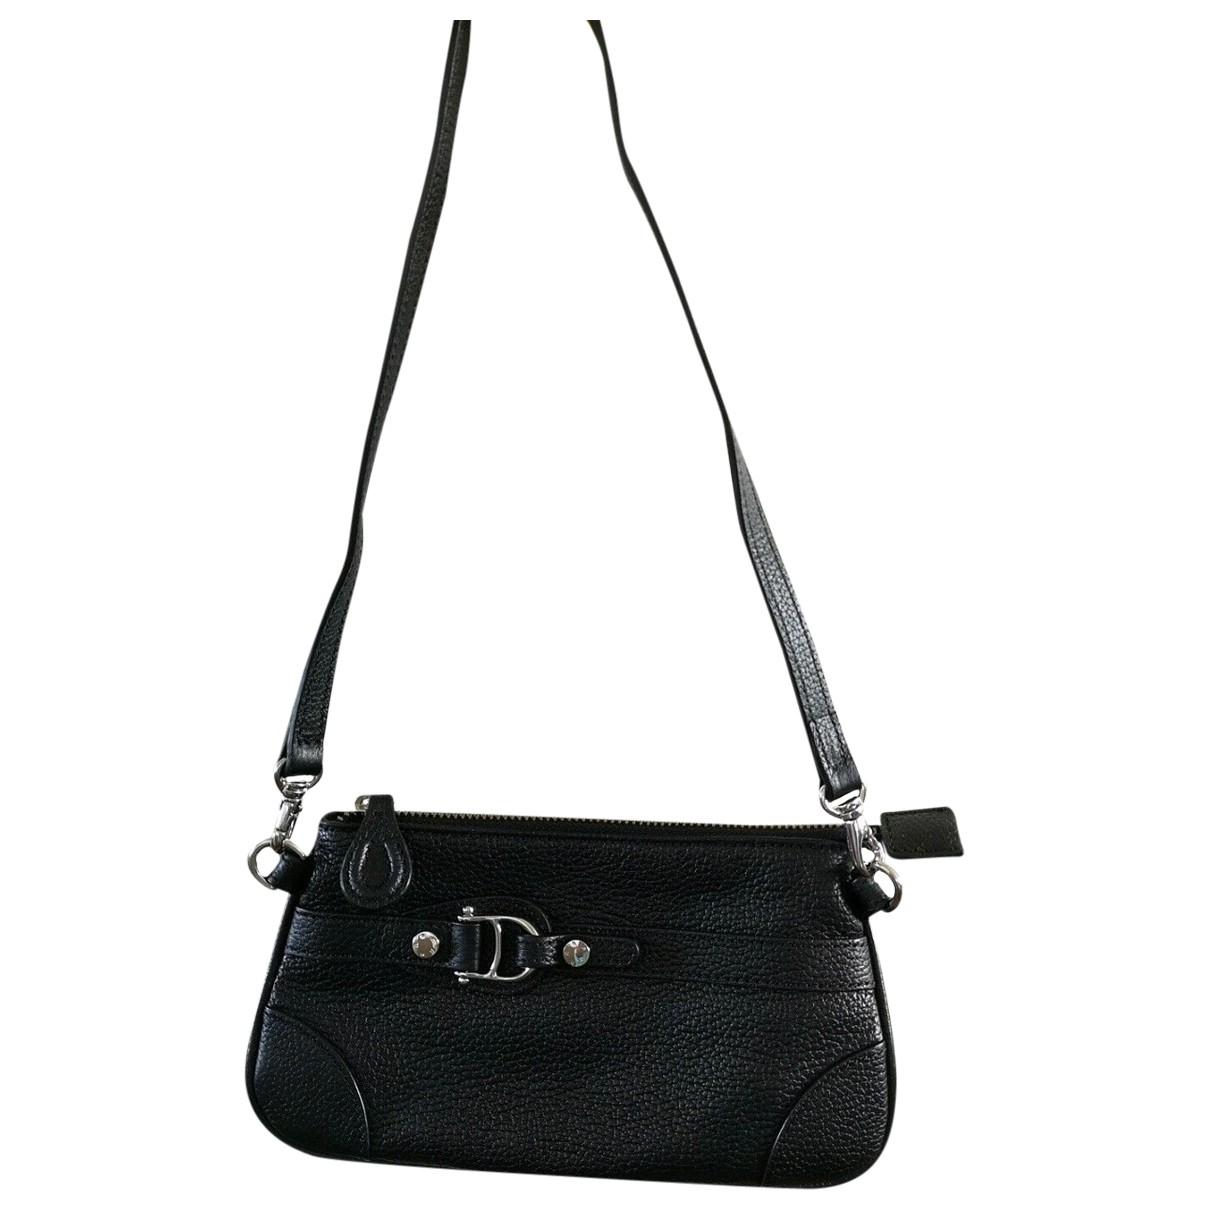 Etienne Aigner \N Black Leather handbag for Women \N